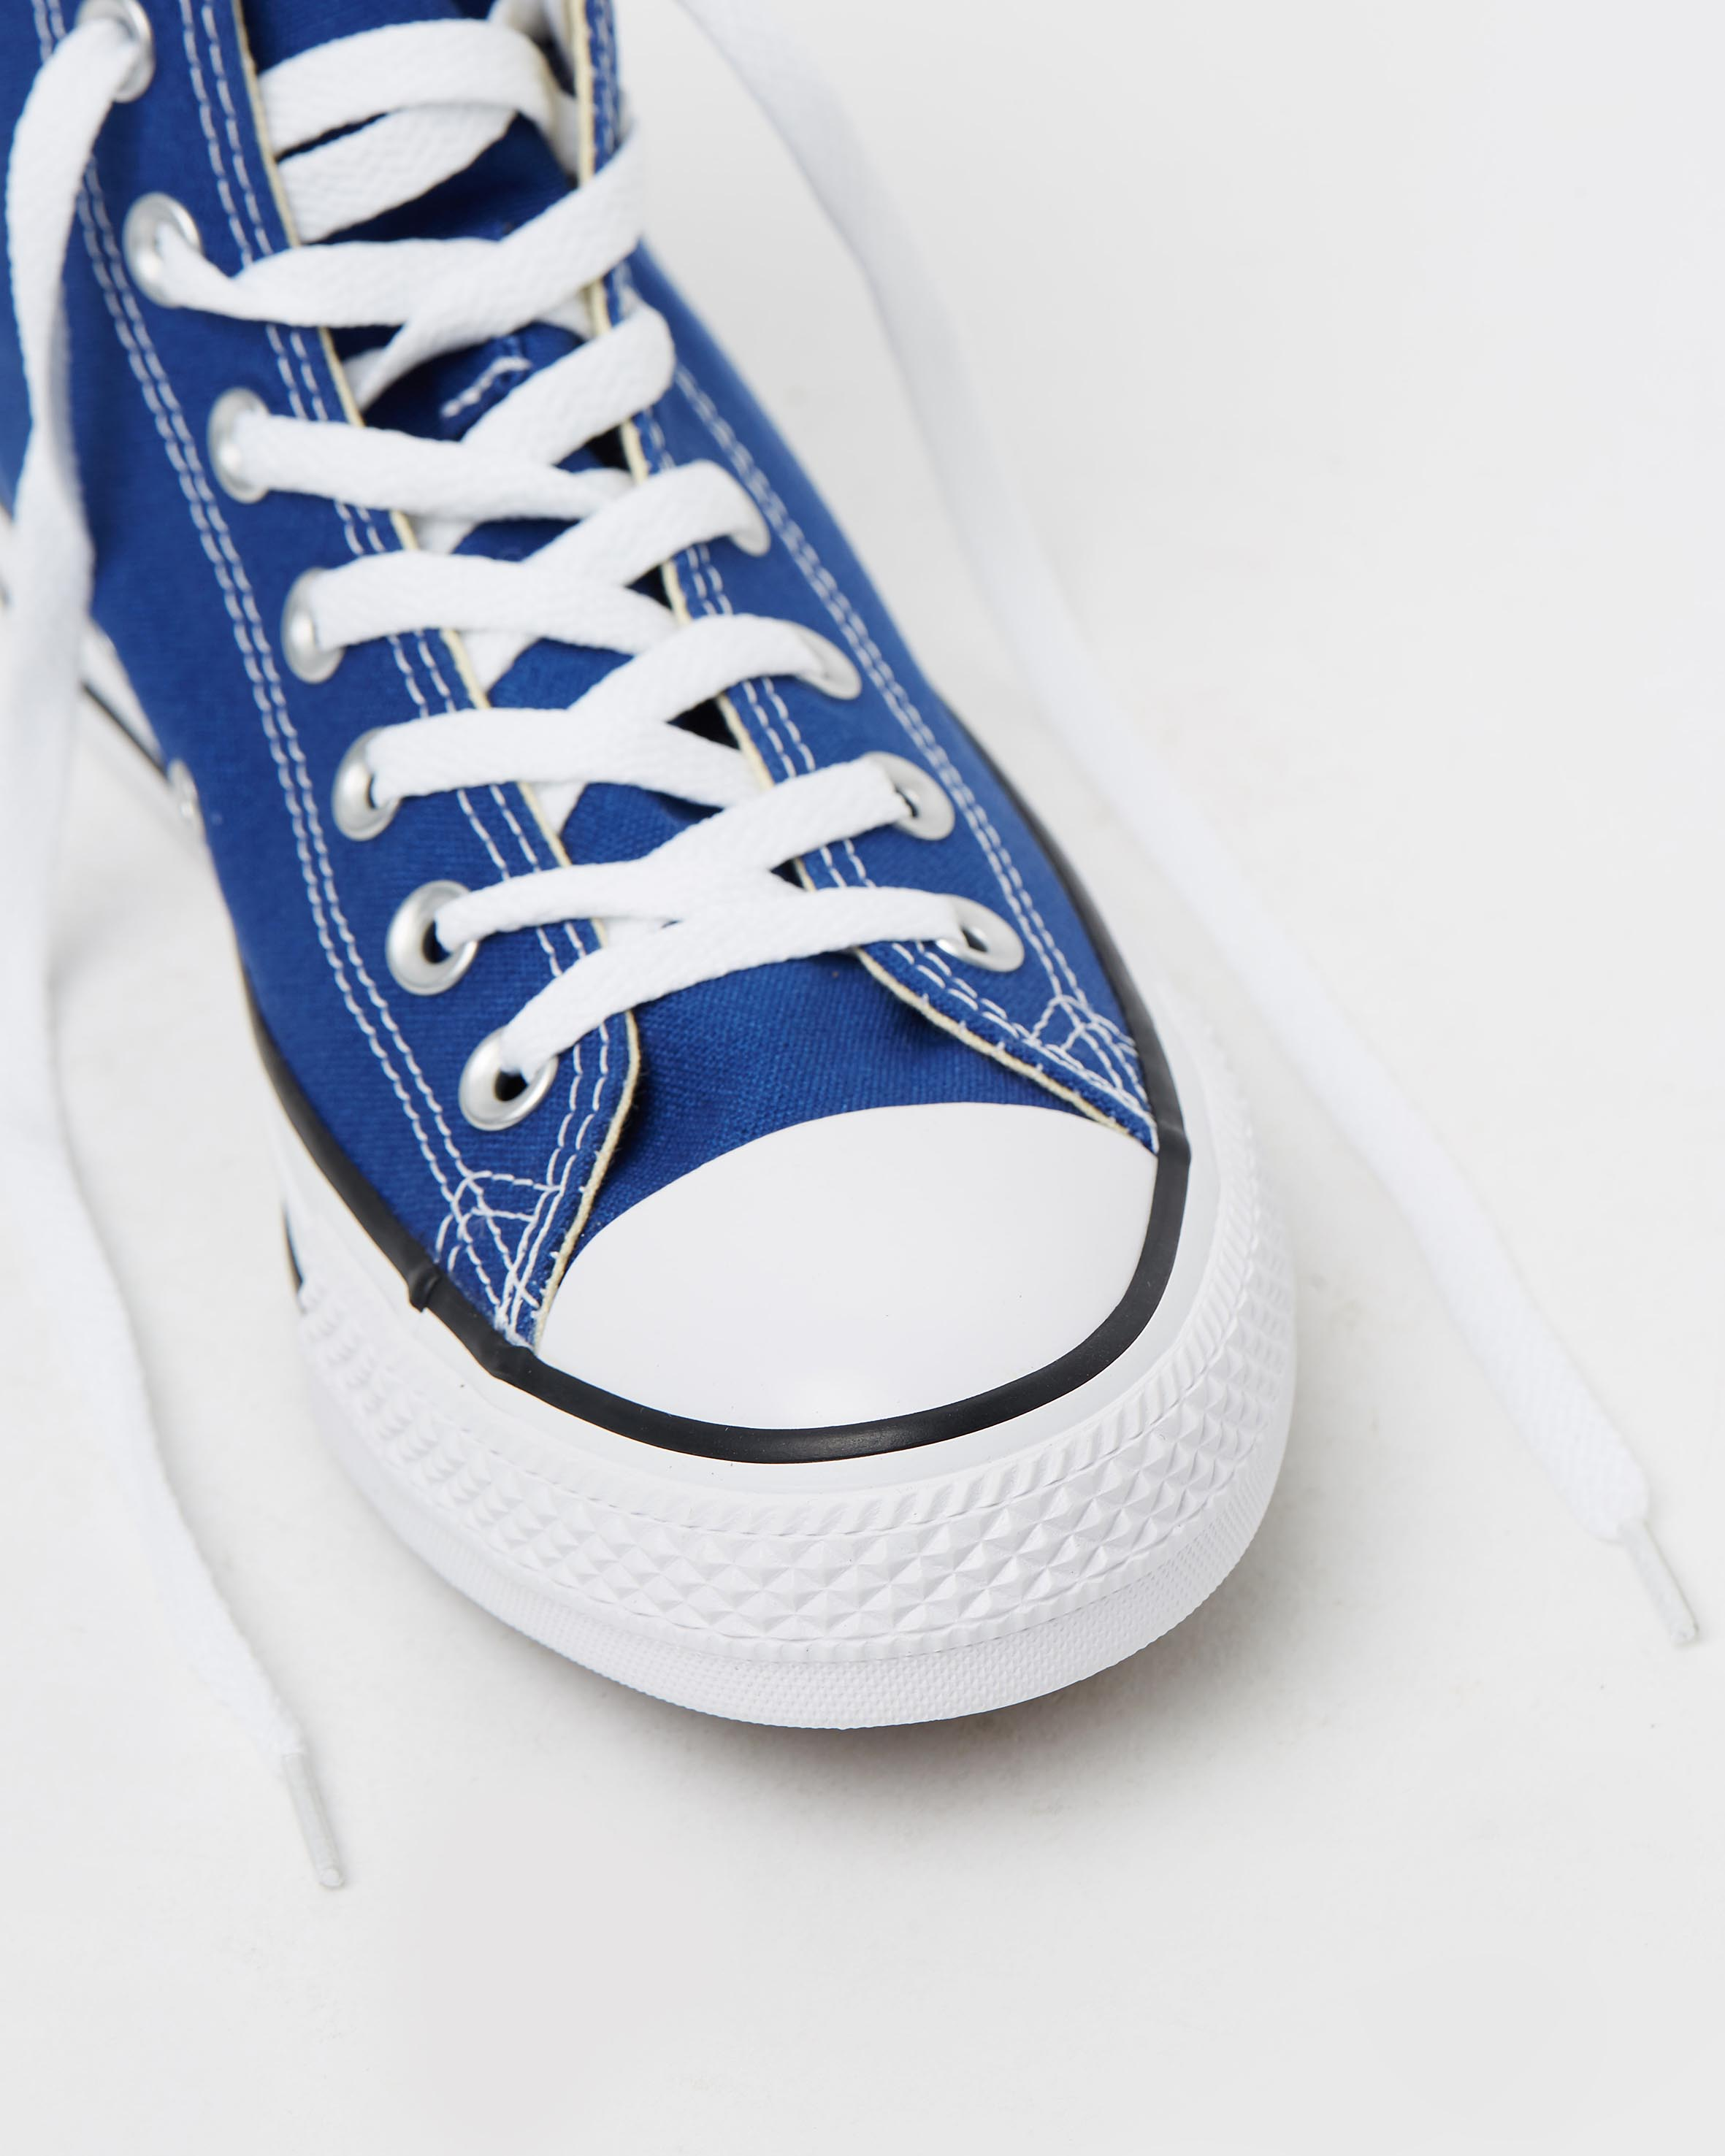 869b5d69dfee ... colors high top shoes 977oxtnr dbc24 60a2e; promo code converse chuck  taylor all star hi womens roadtrip blue 4 775e8 85bdb